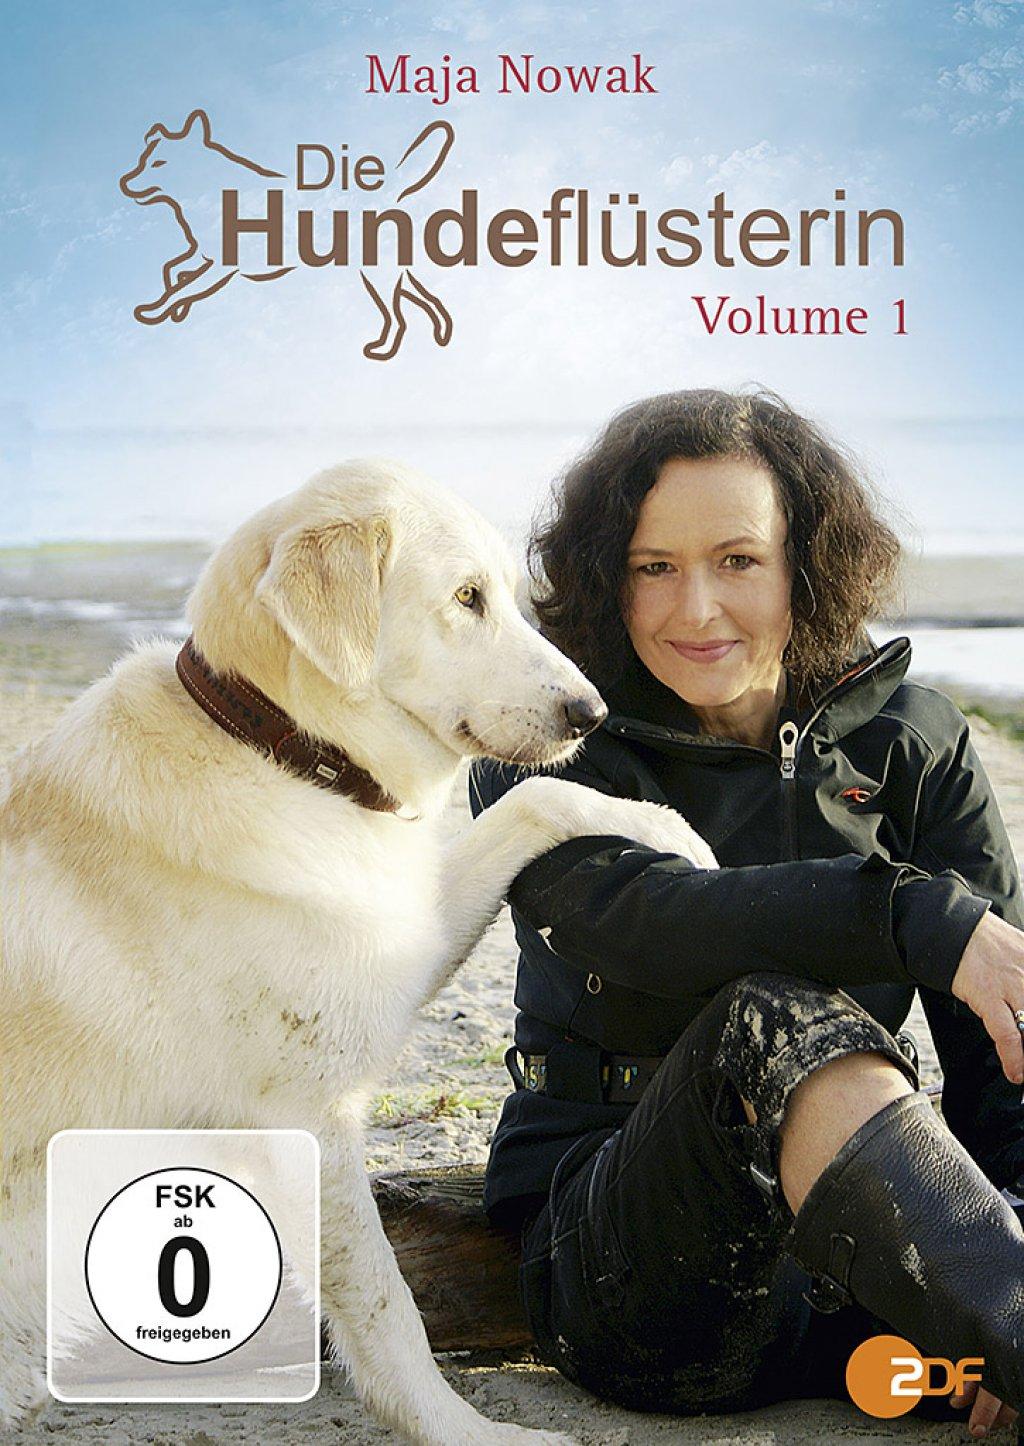 Die Hundeflüsterin - Volume 1 (DVD)